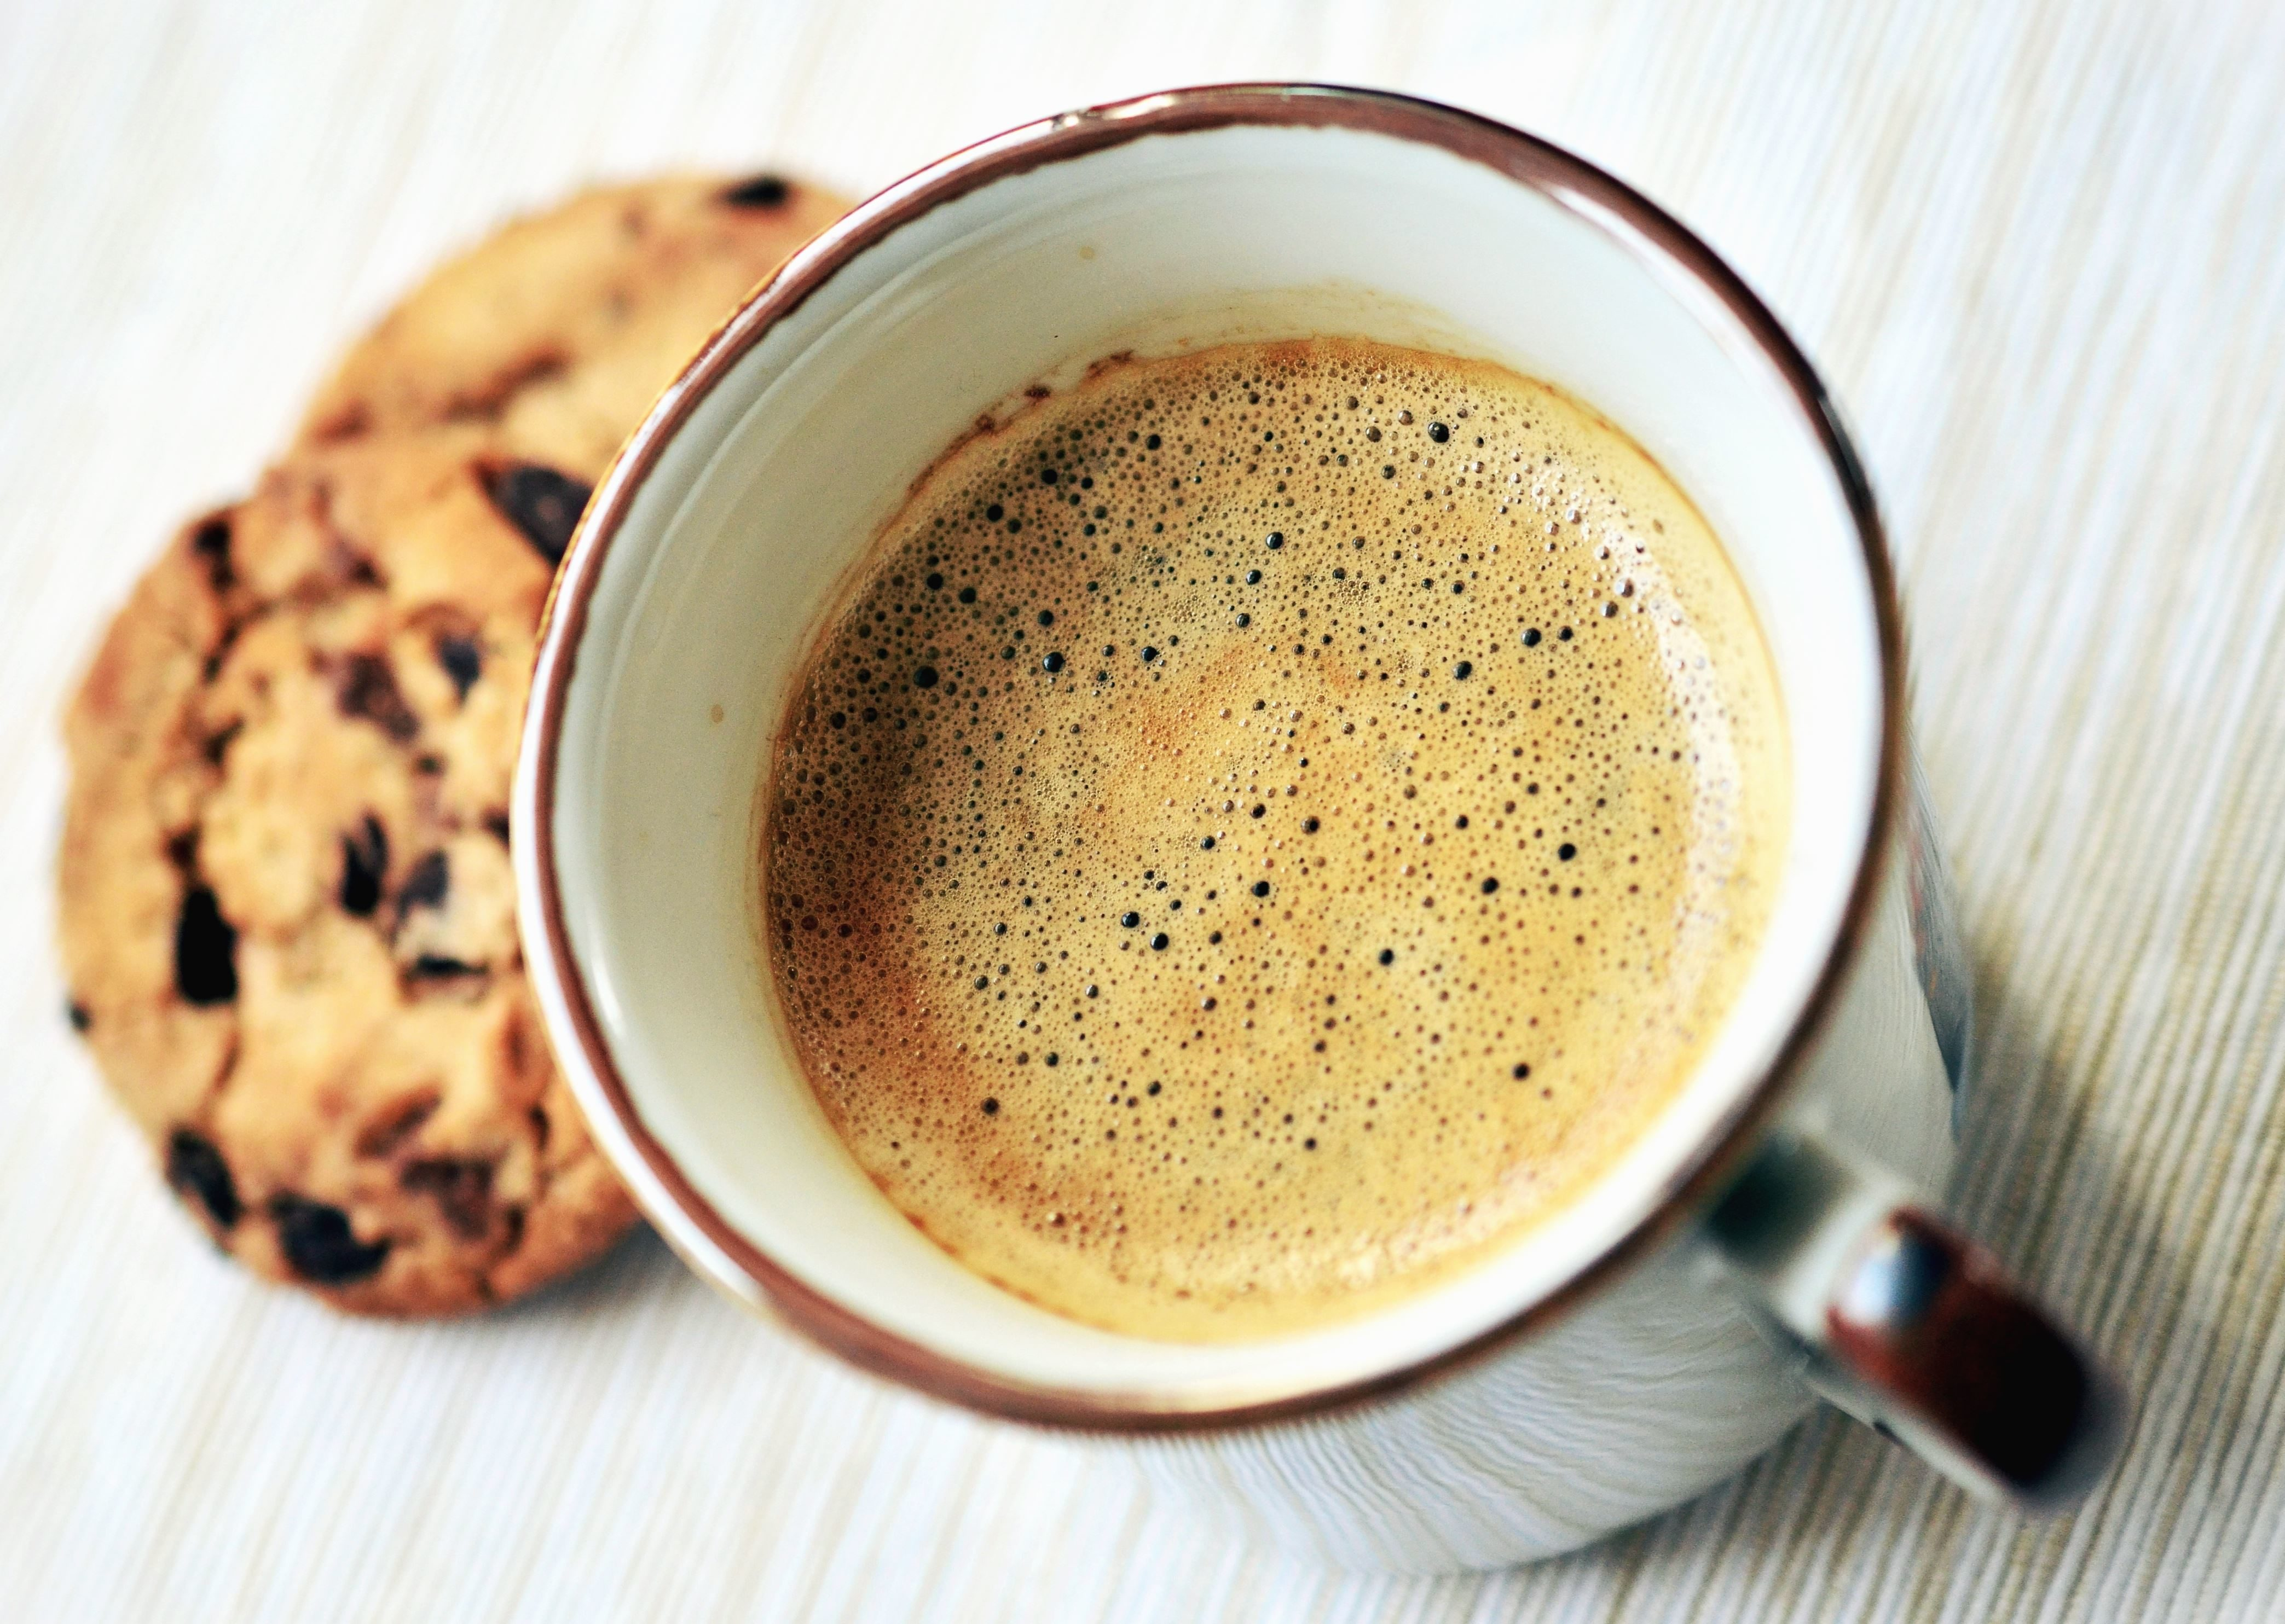 Kostenlose Bild: Keramik, Kaffeetasse, Kuchen, Essen